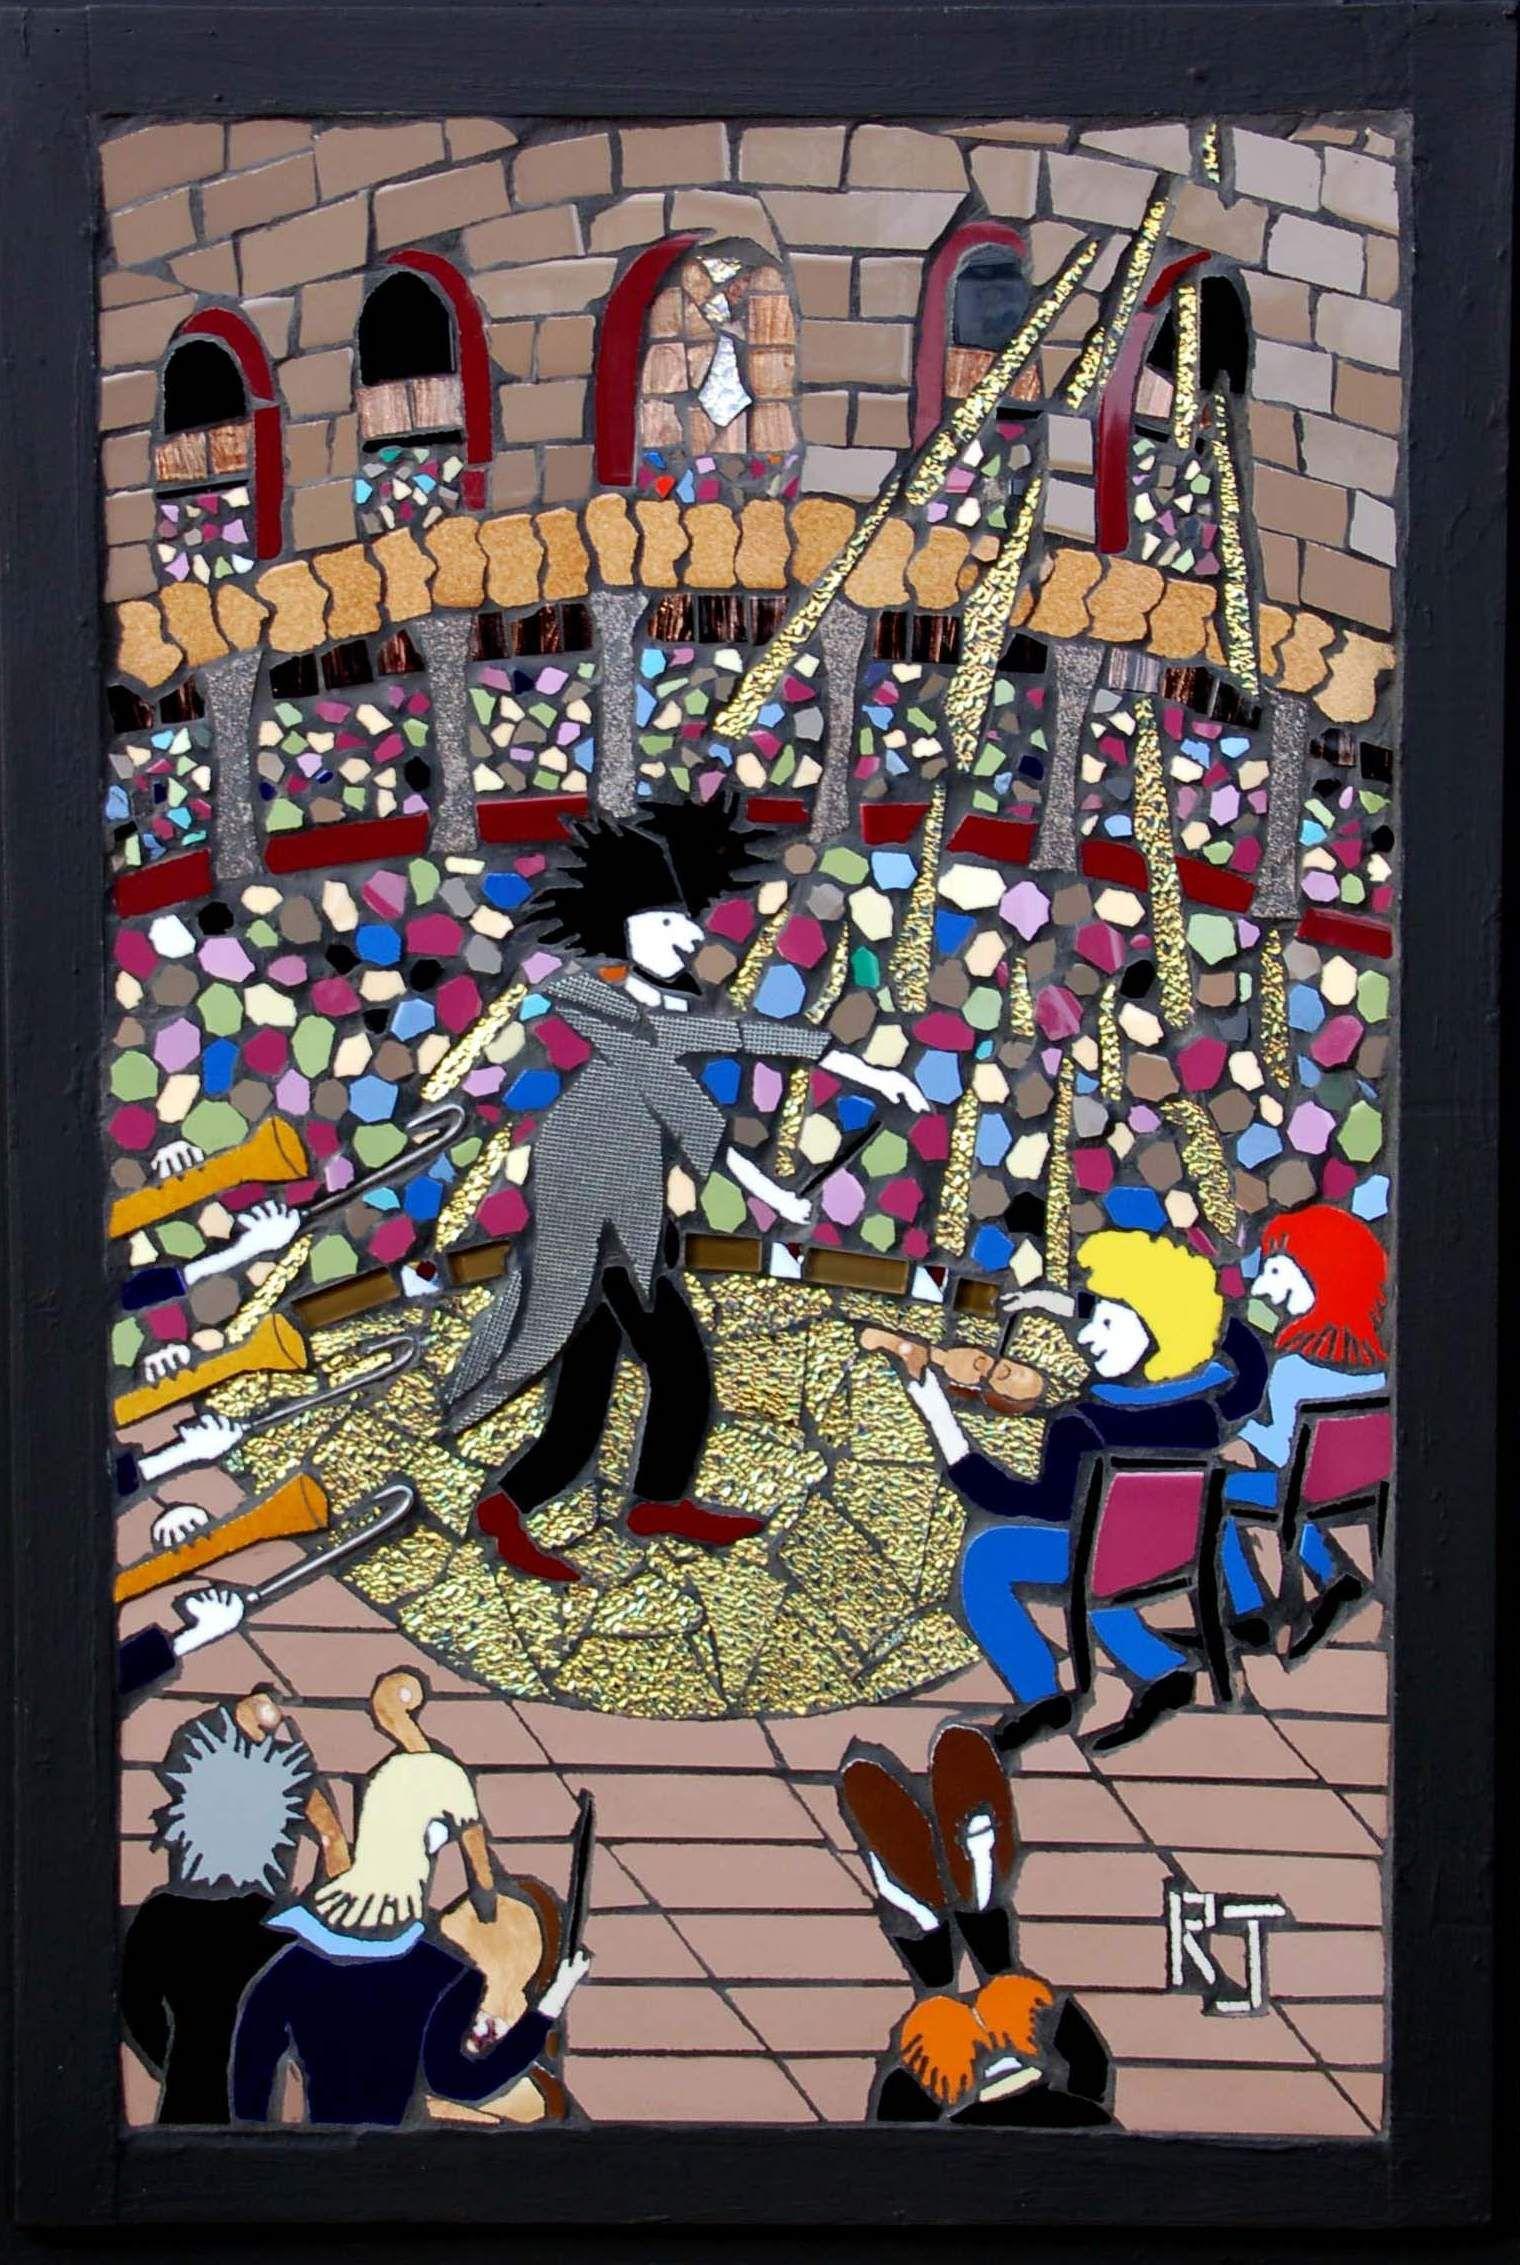 The maestro 75 cm x 50 cm mosaic art wall hanging ceramic 75 cm x 50 cm mosaic art wall hanging dailygadgetfo Gallery